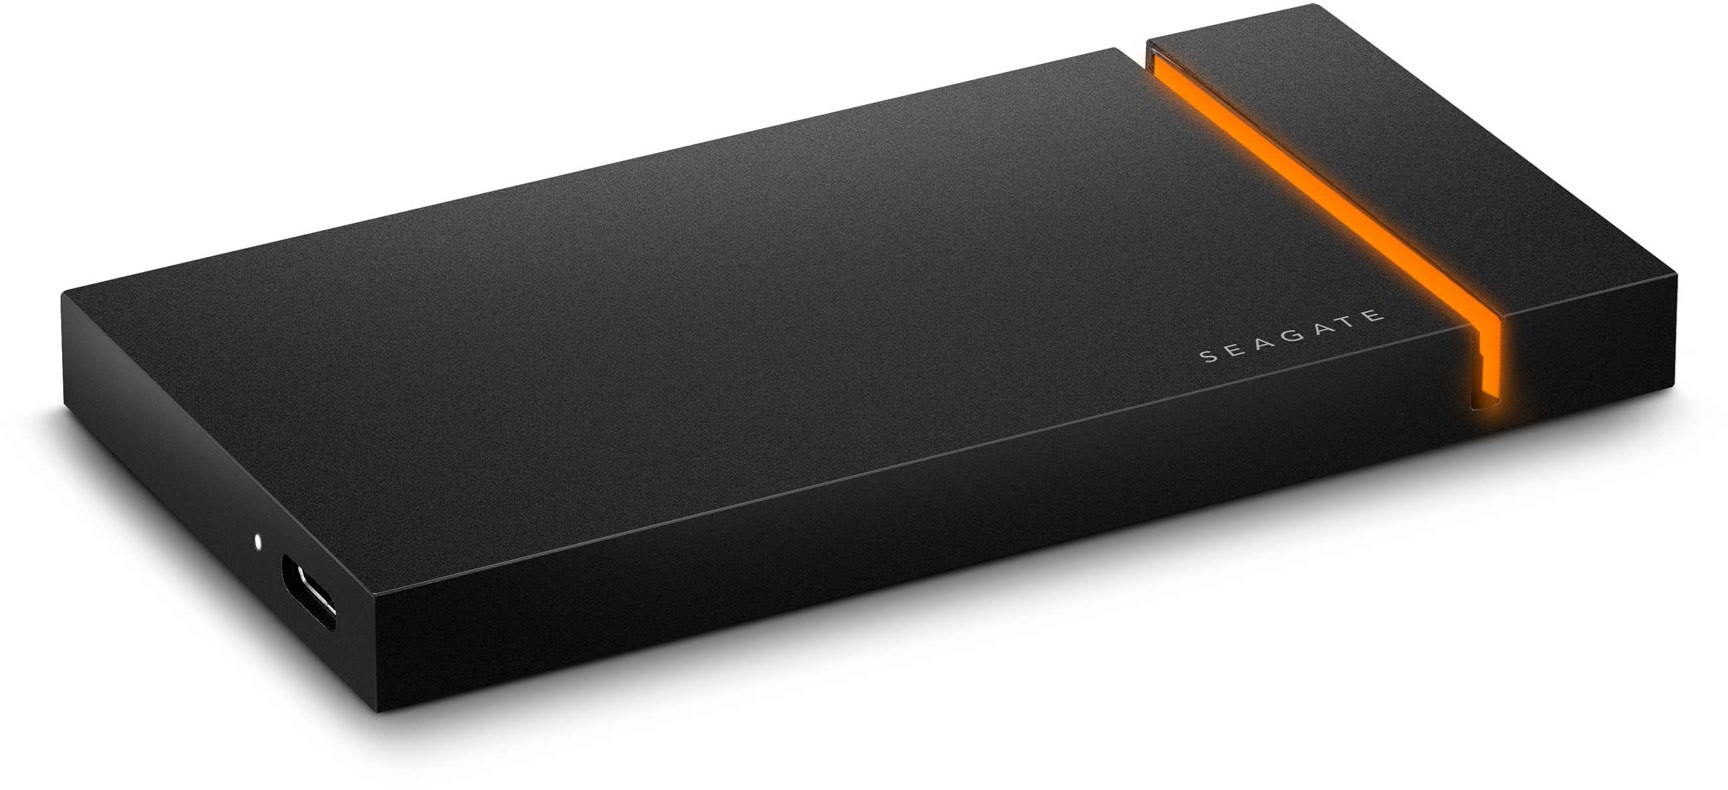 Seagate Firecuda Gaming SSD 2 TB Externe SSD schwarz